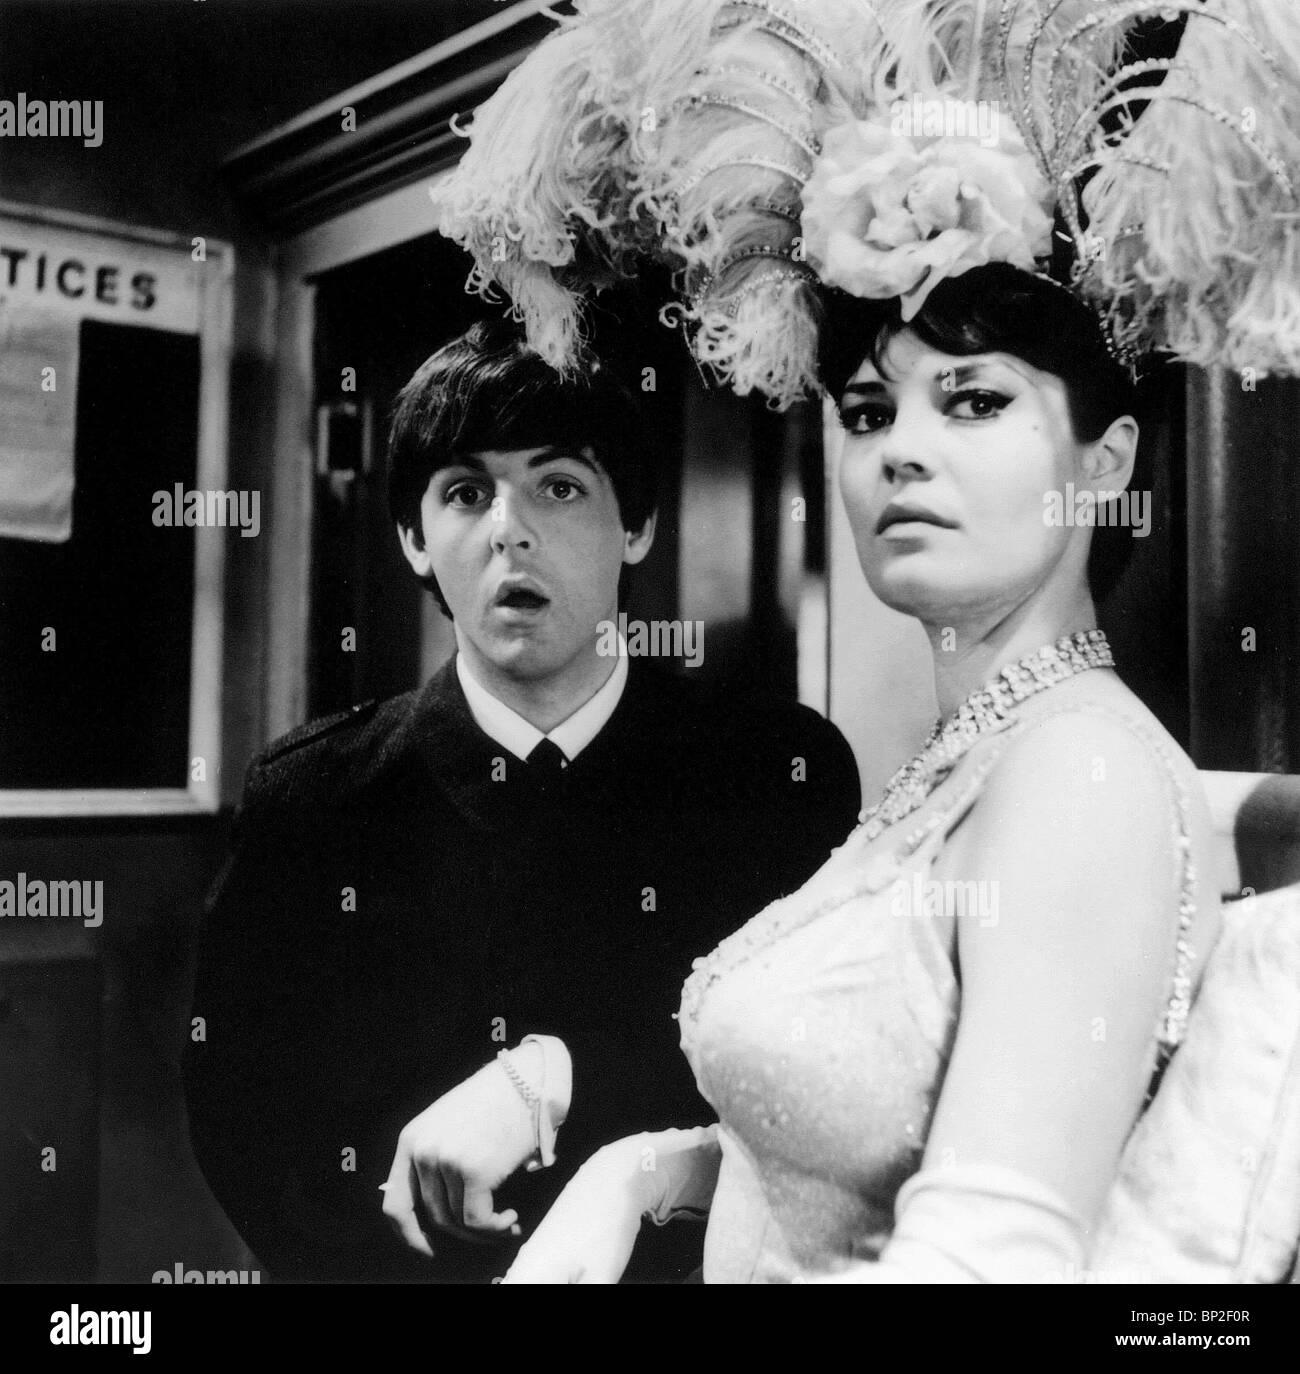 PAUL MCCARTNEY, ROSEMARIE FRANKLAND, A HARD DAY'S NIGHT, 1964 - Stock Image